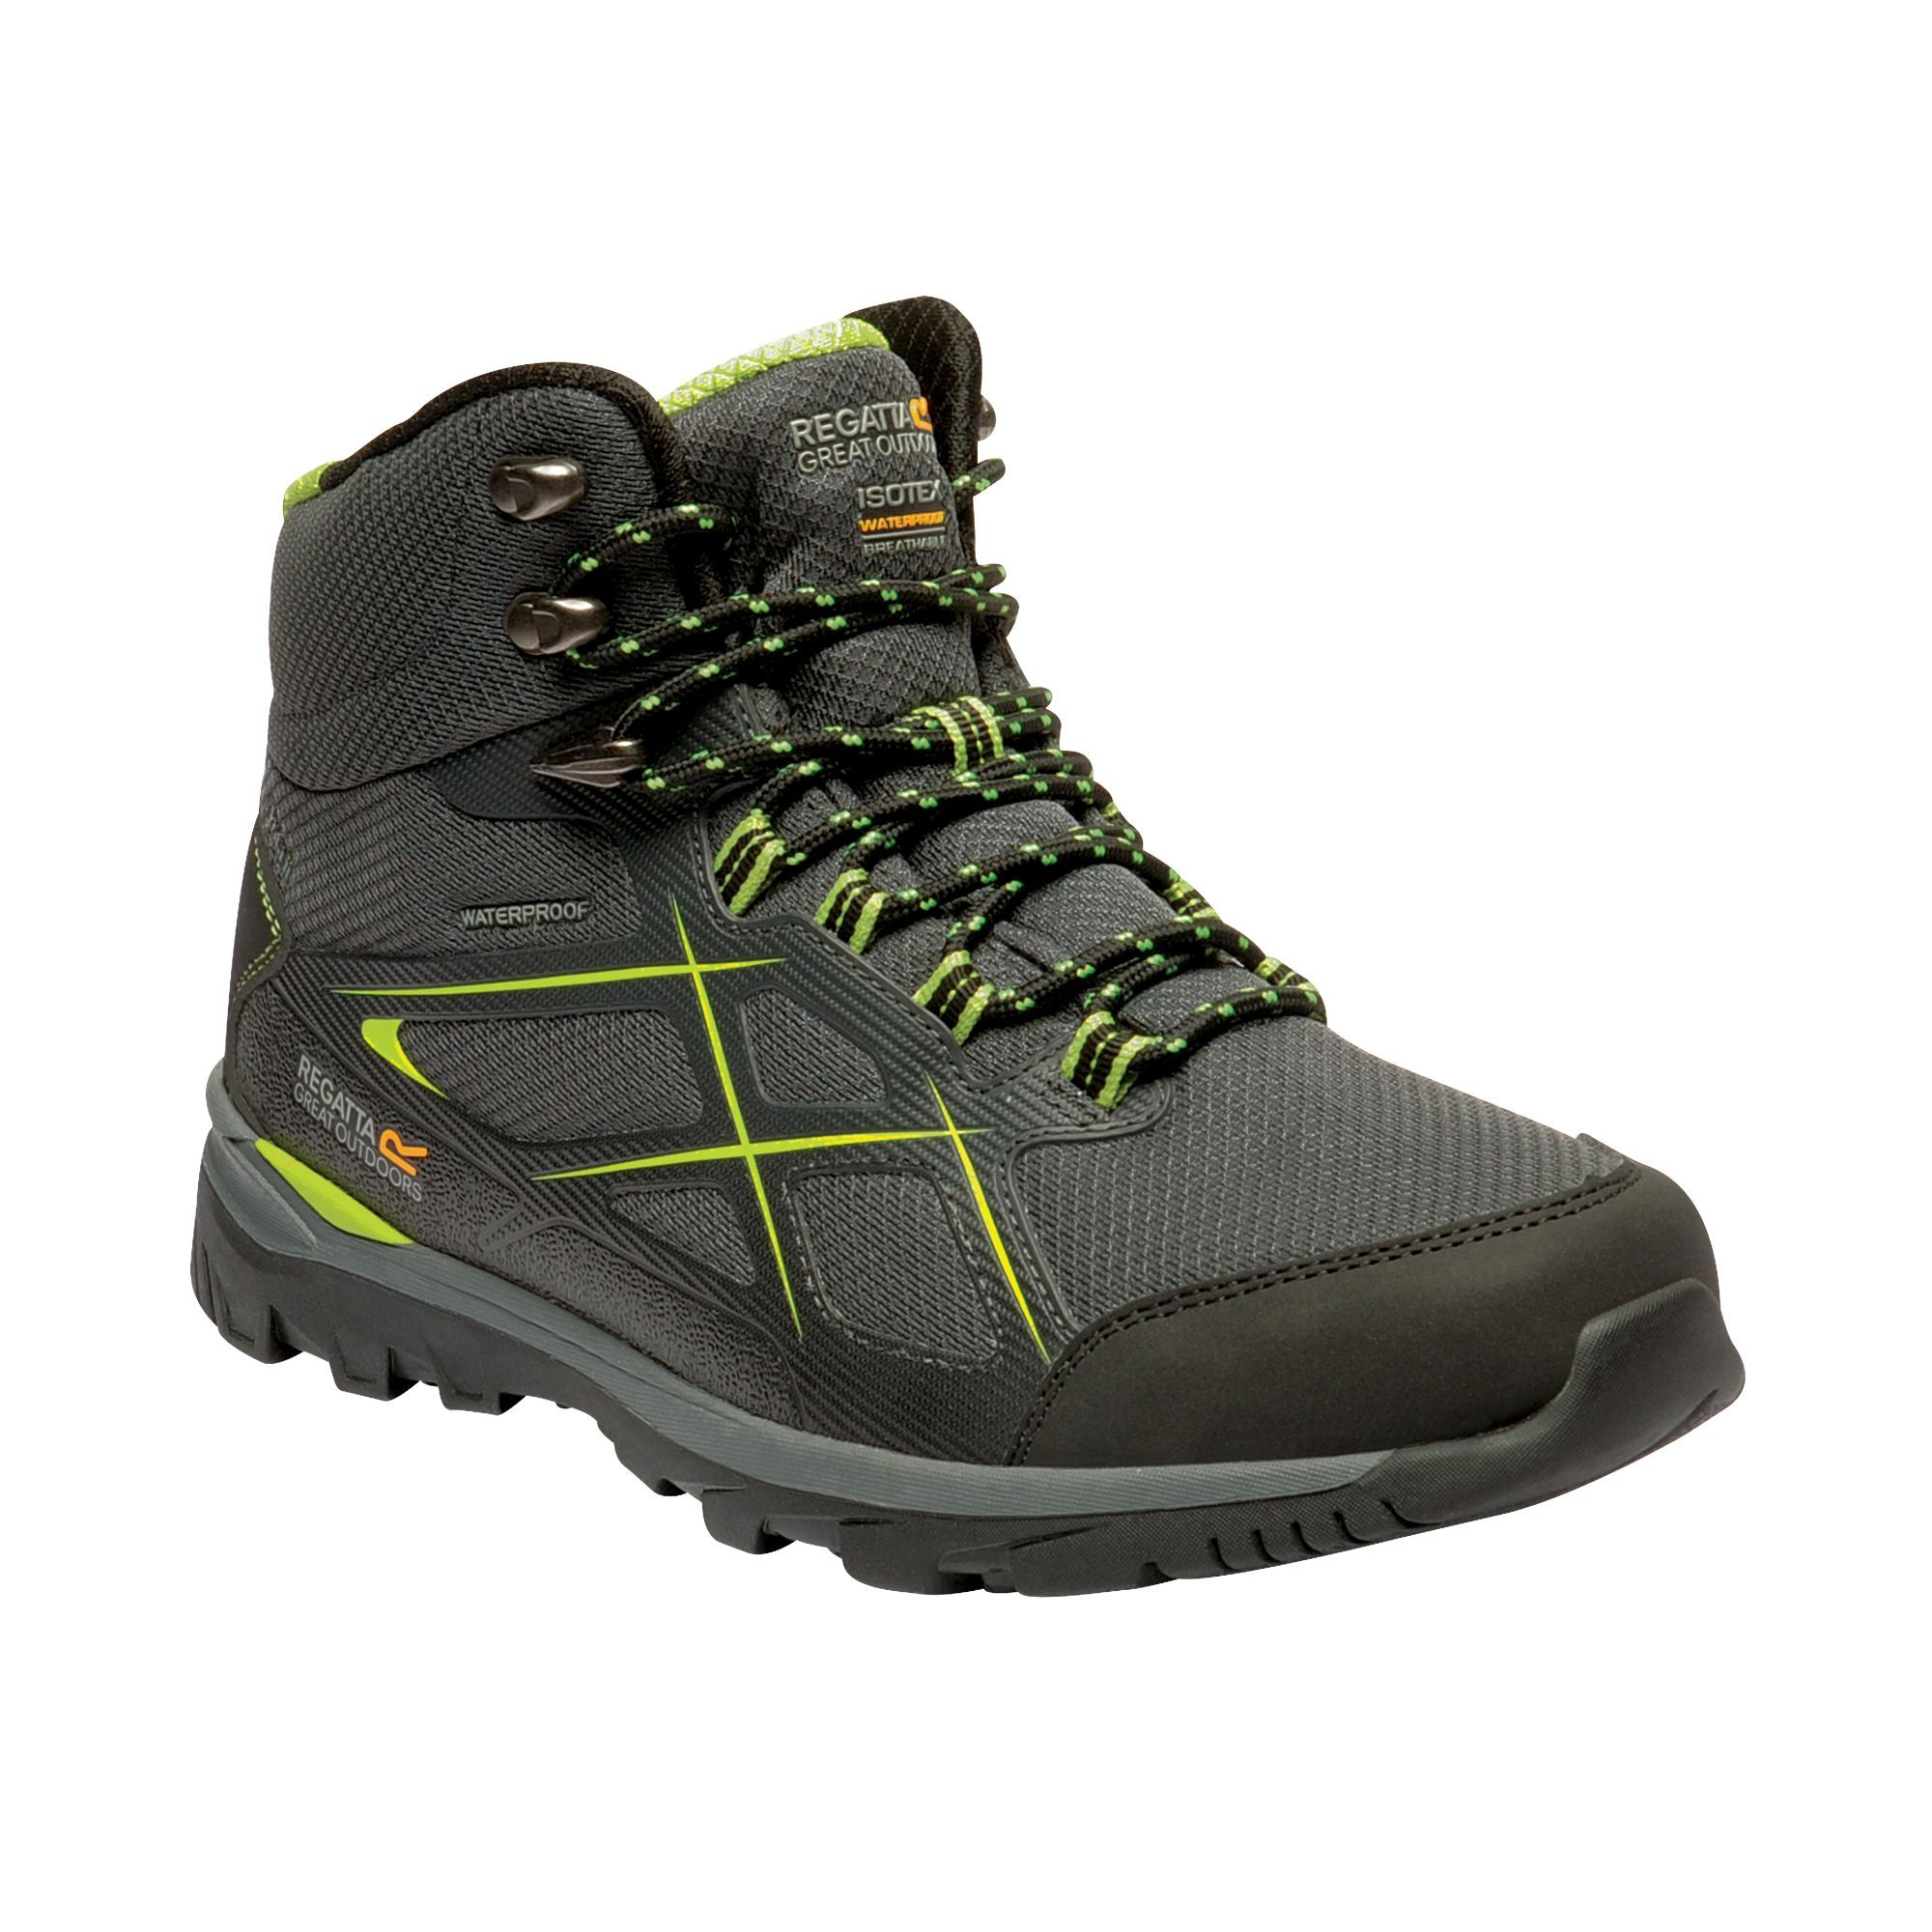 Regatta Great Outdoors Mens Kota Mid II Waterproof Walking Boots